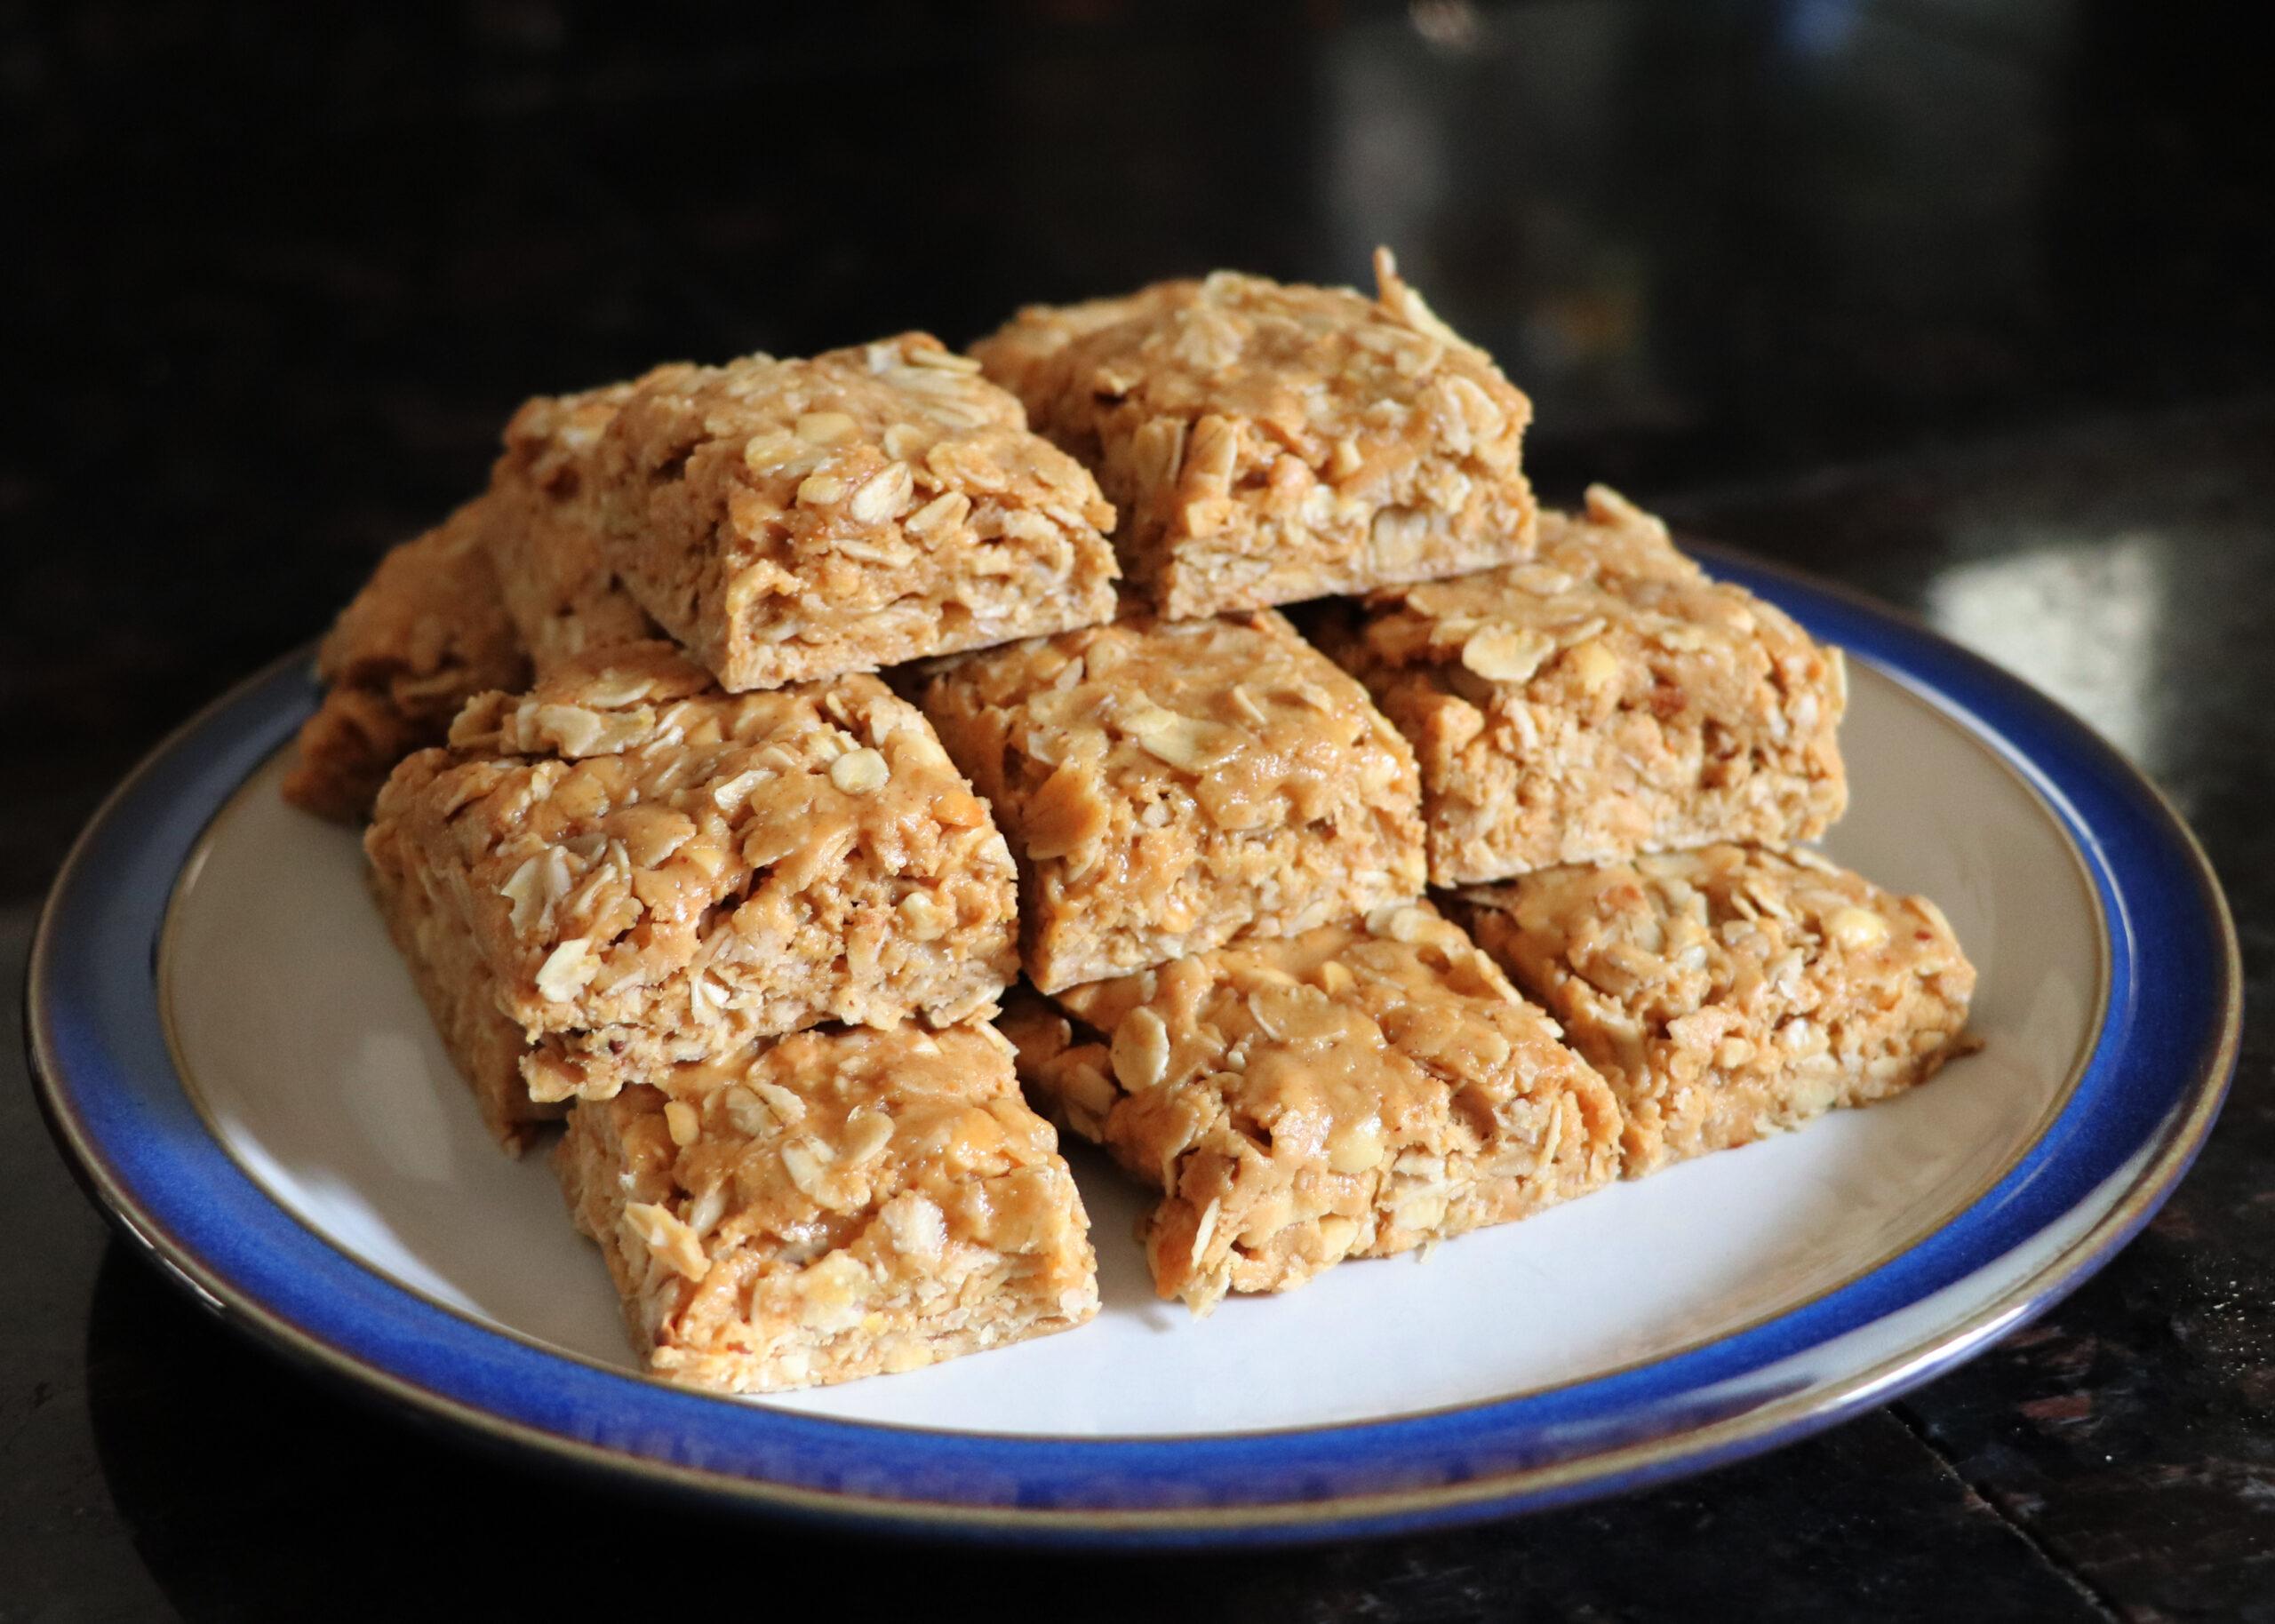 Yummy Gluten-Free Peanutbutter Breakfast Bars